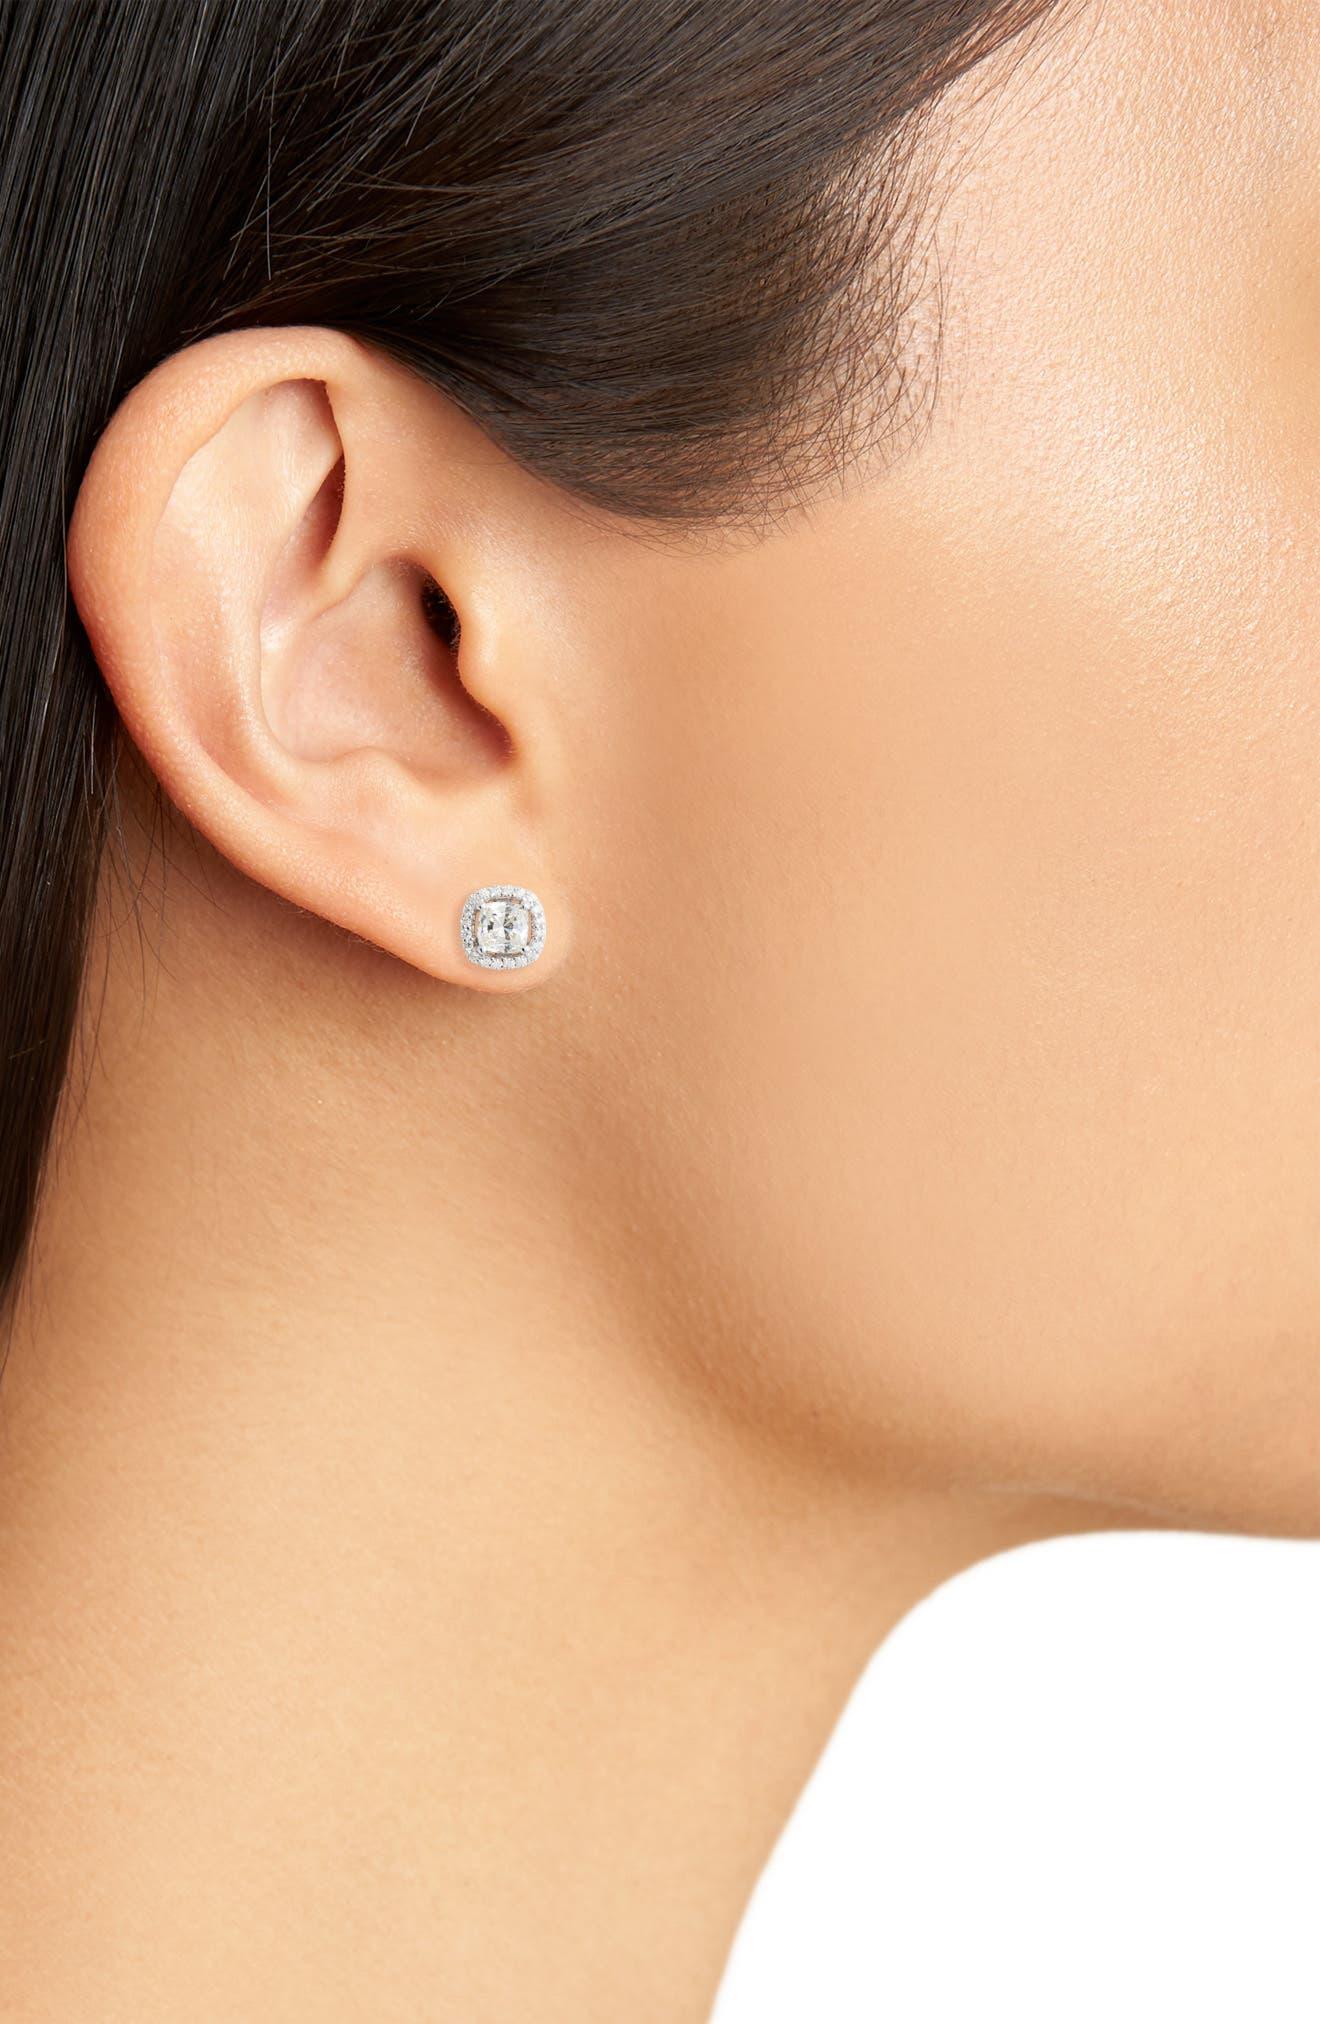 Cushion Cut Simulated Diamond Stud Earrings,                             Alternate thumbnail 2, color,                             SILVER/ CLEAR